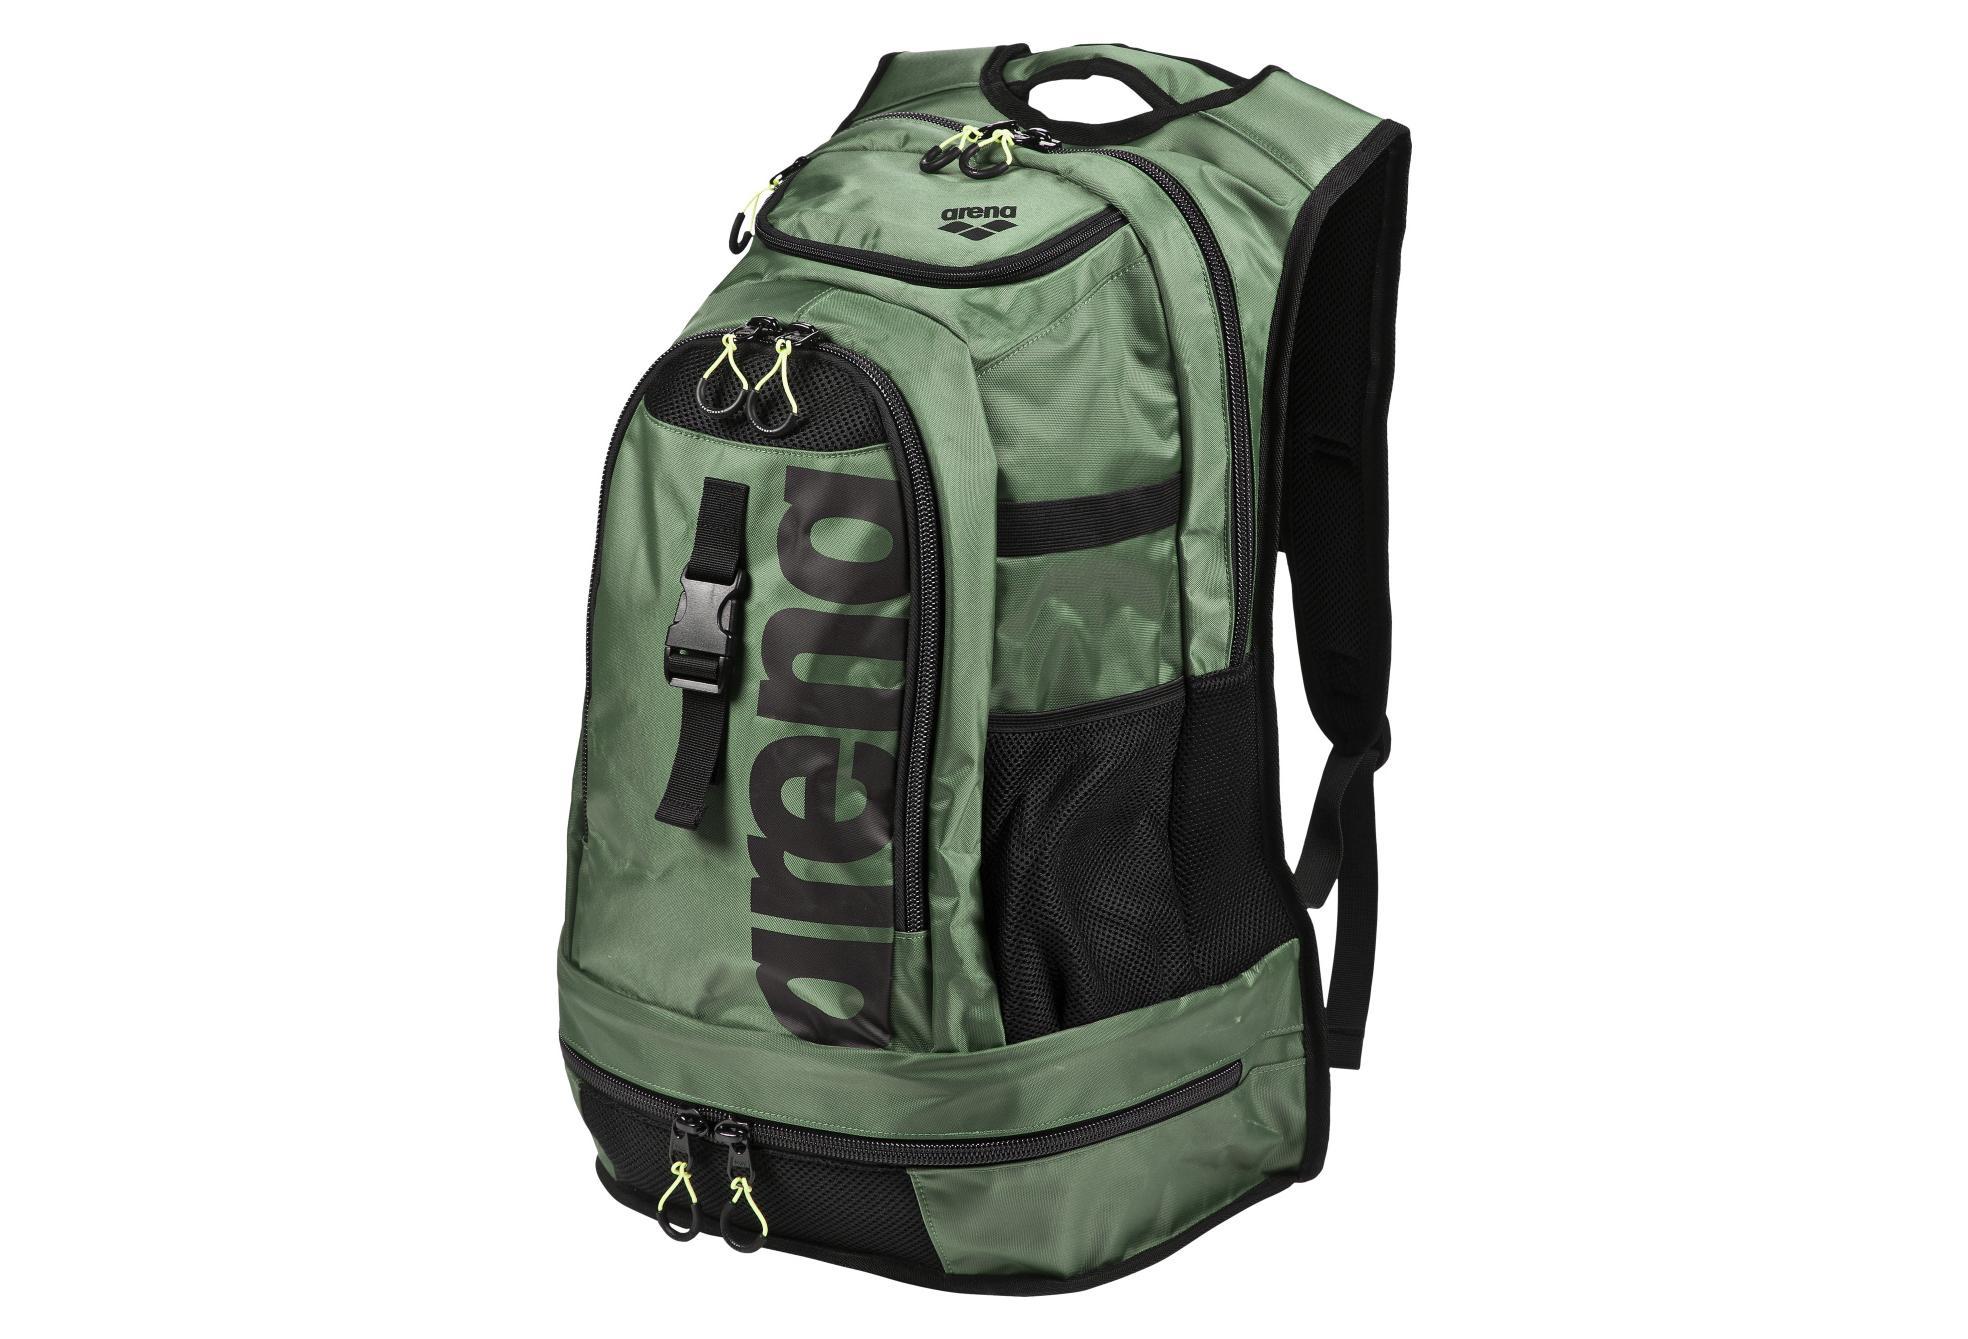 044a33c89875 ARENA FASTPACK 2.1 Backpack Khaki Camo